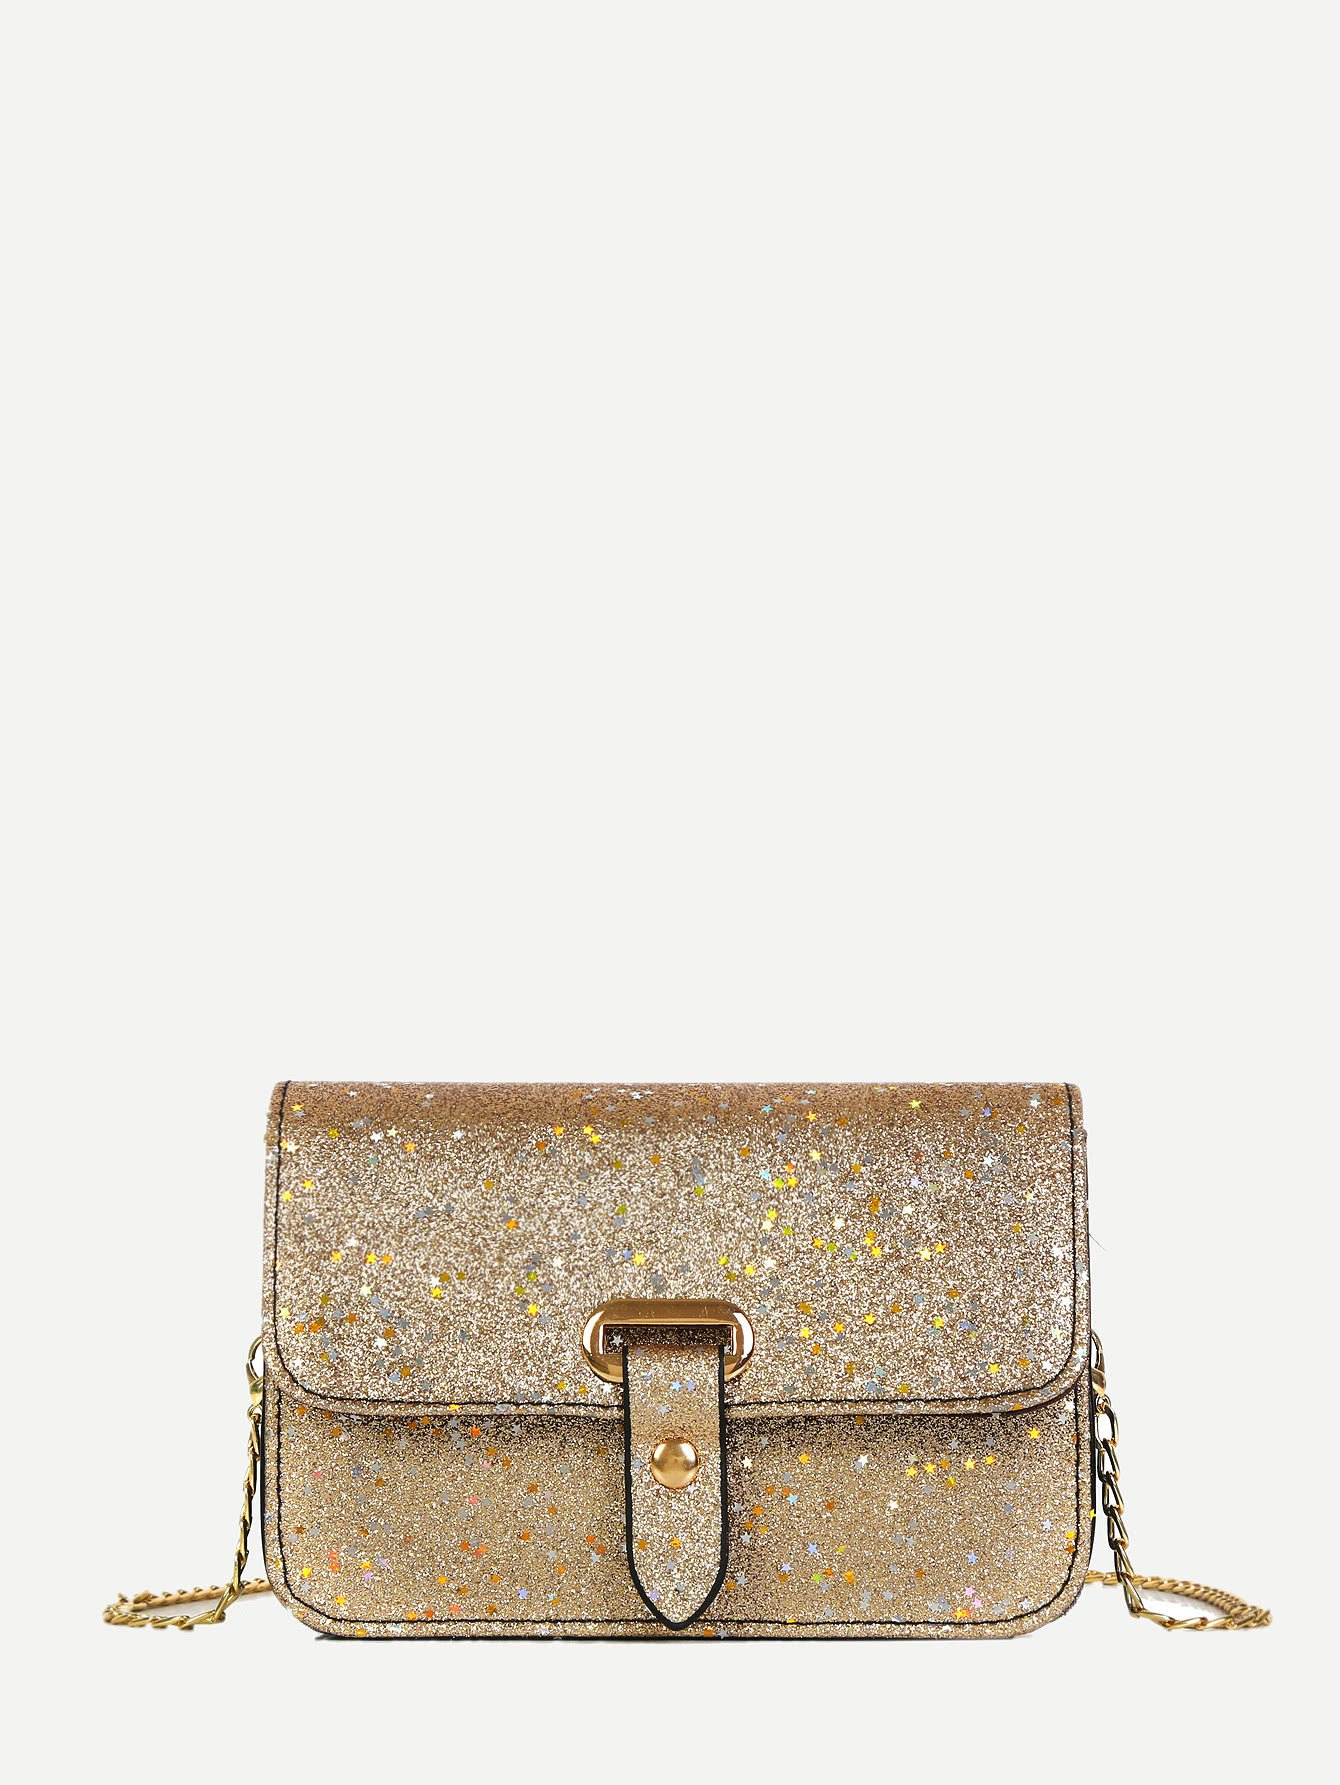 Flap Glitter Chain Bag